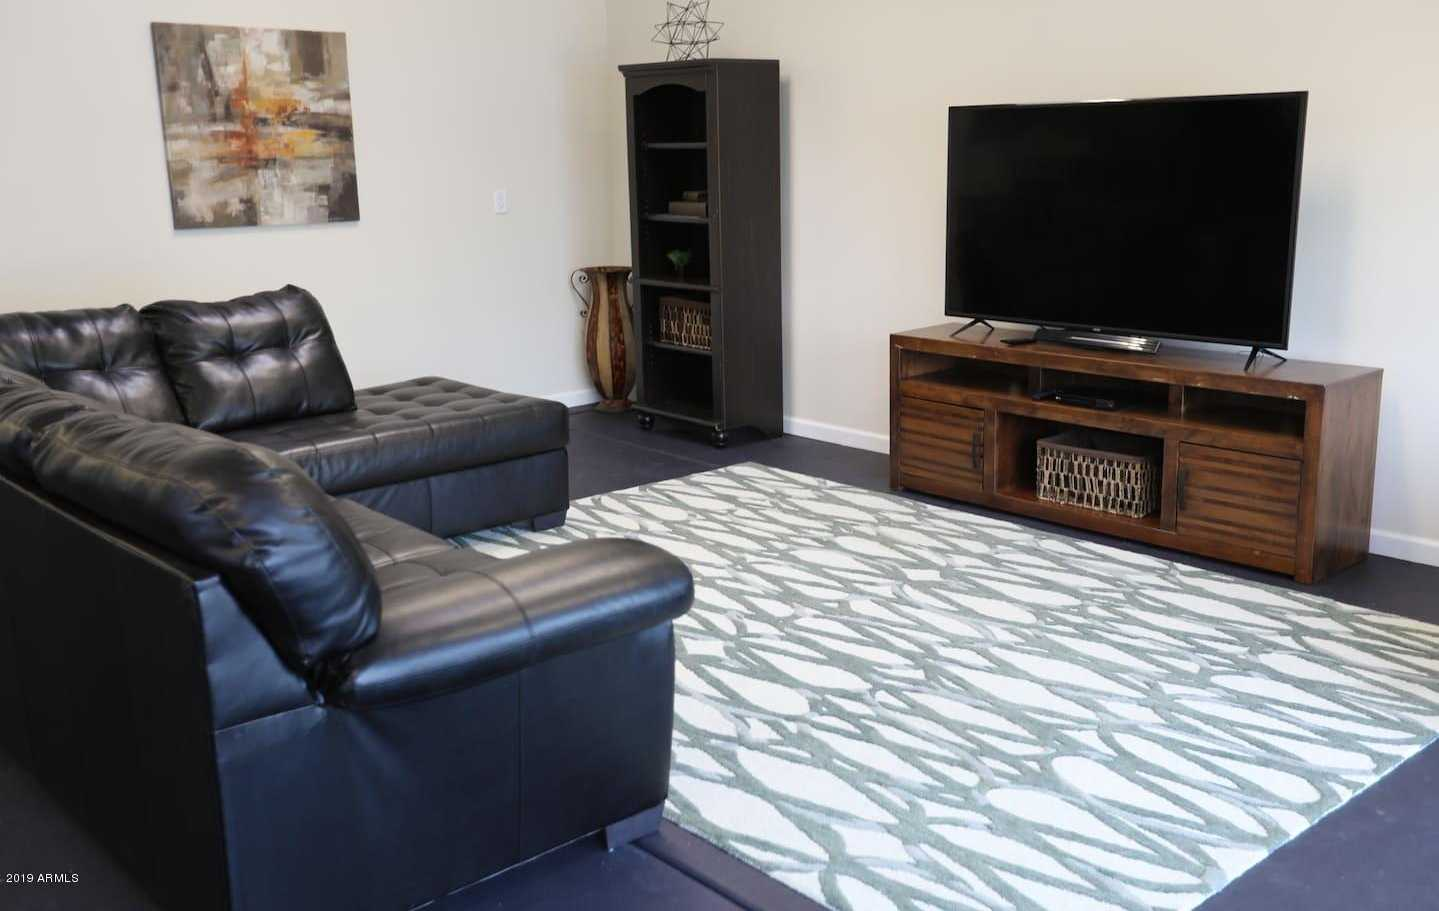 $800,000 - 8Br/6Ba - Home for Sale in Shea North Estates 2, Scottsdale